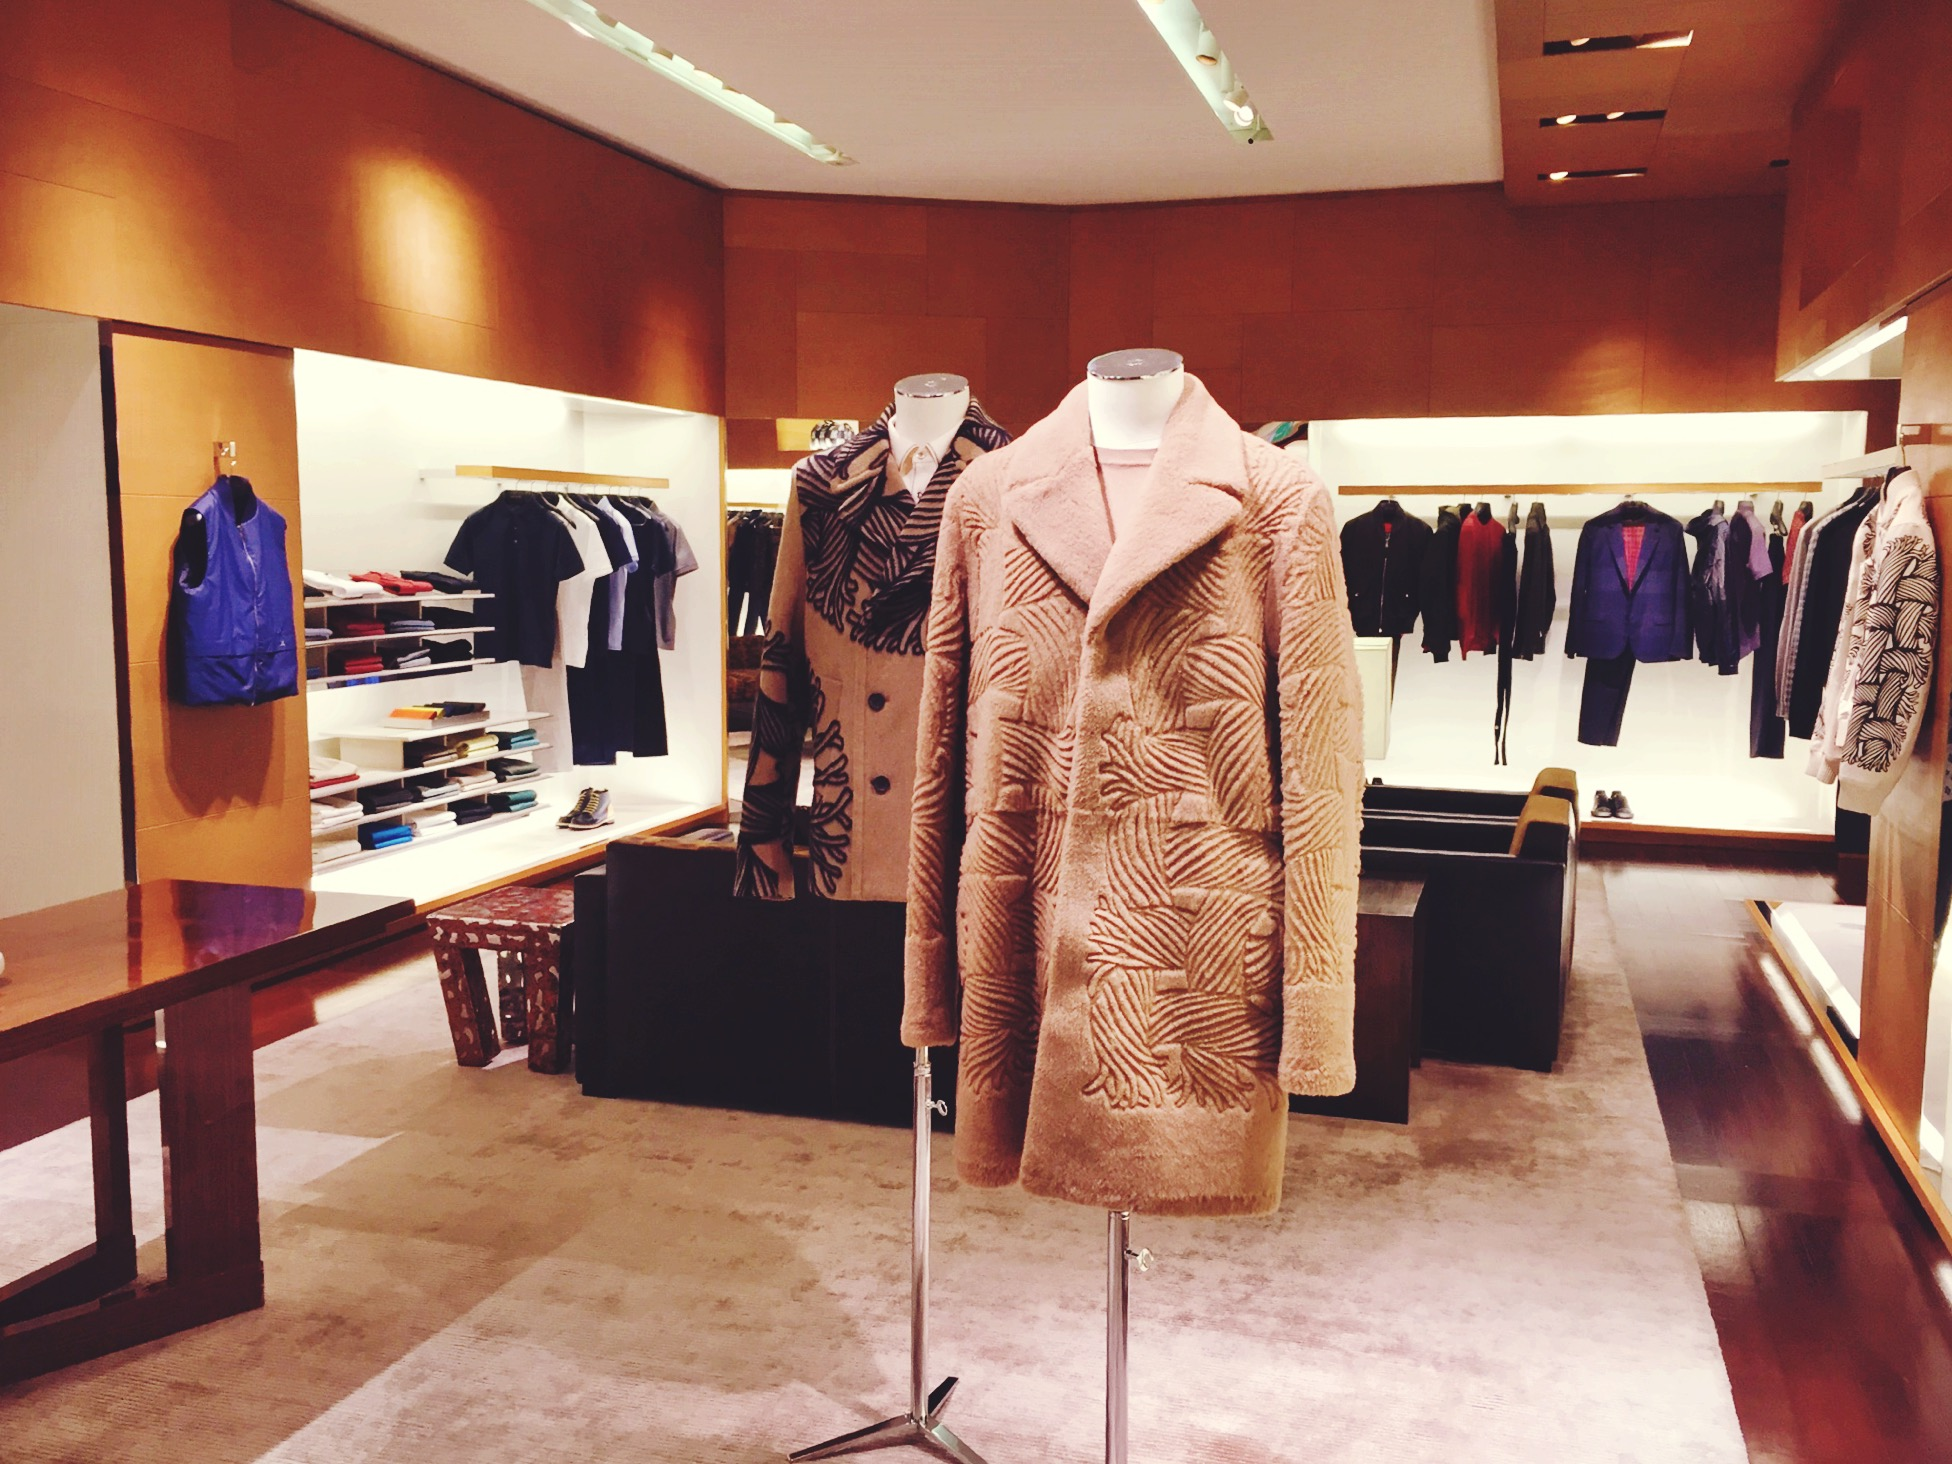 Louis Vuitton in London